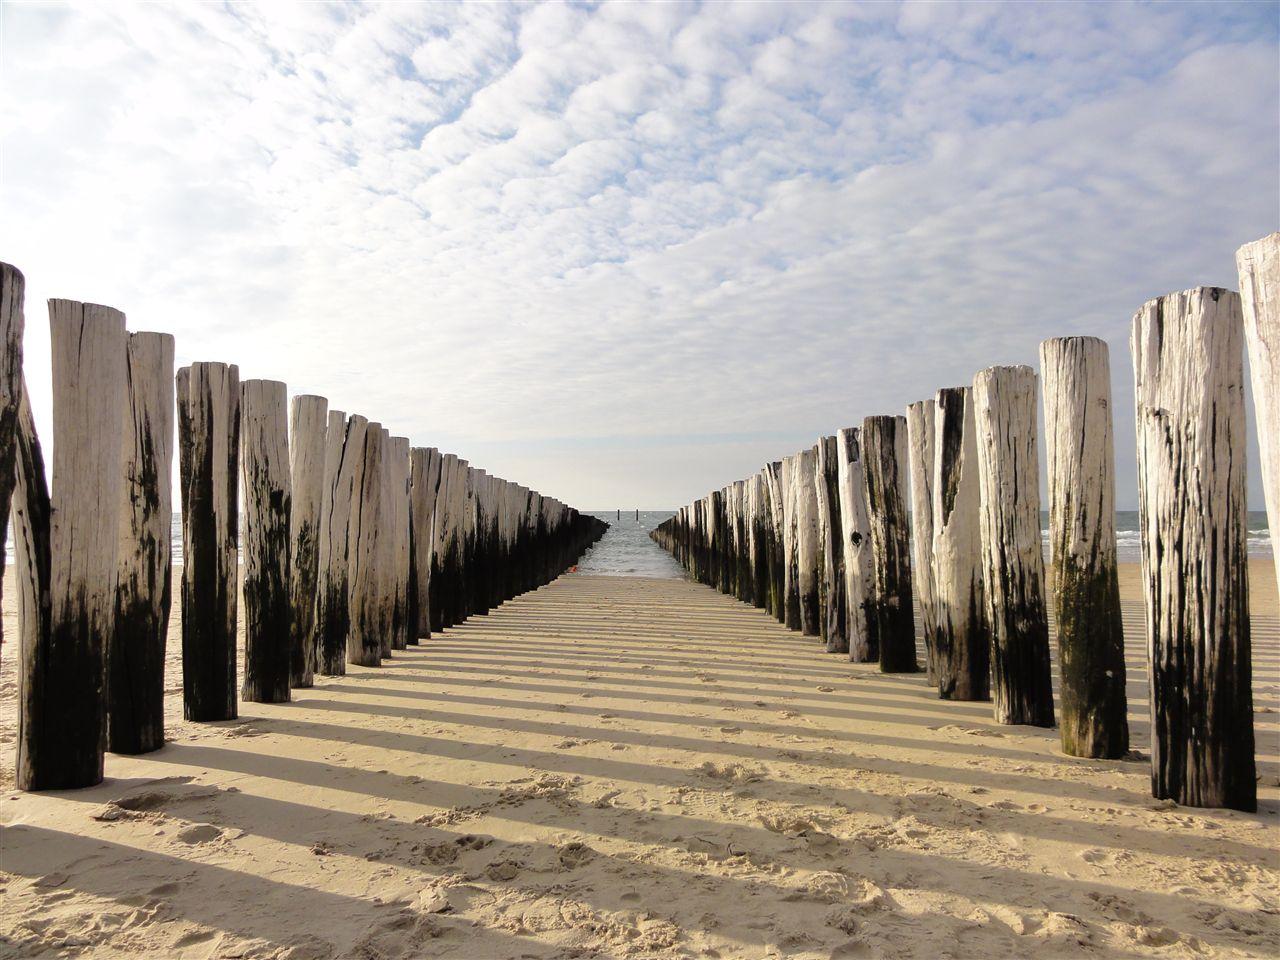 kurzurlaub nordsee holland